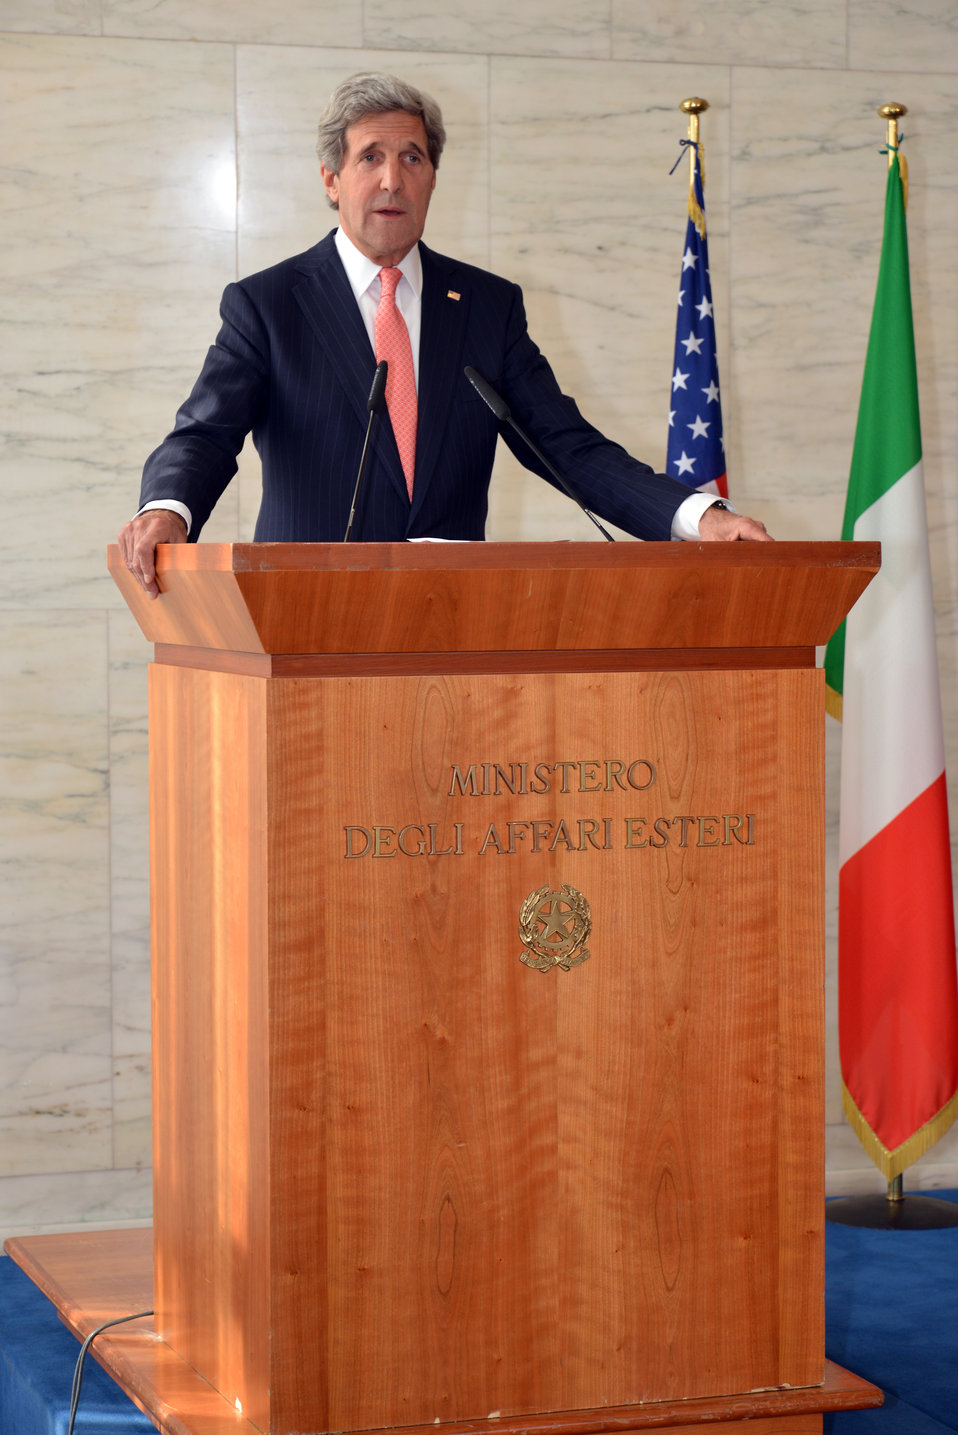 Secretary Kerry Addresses Reporters in Rome